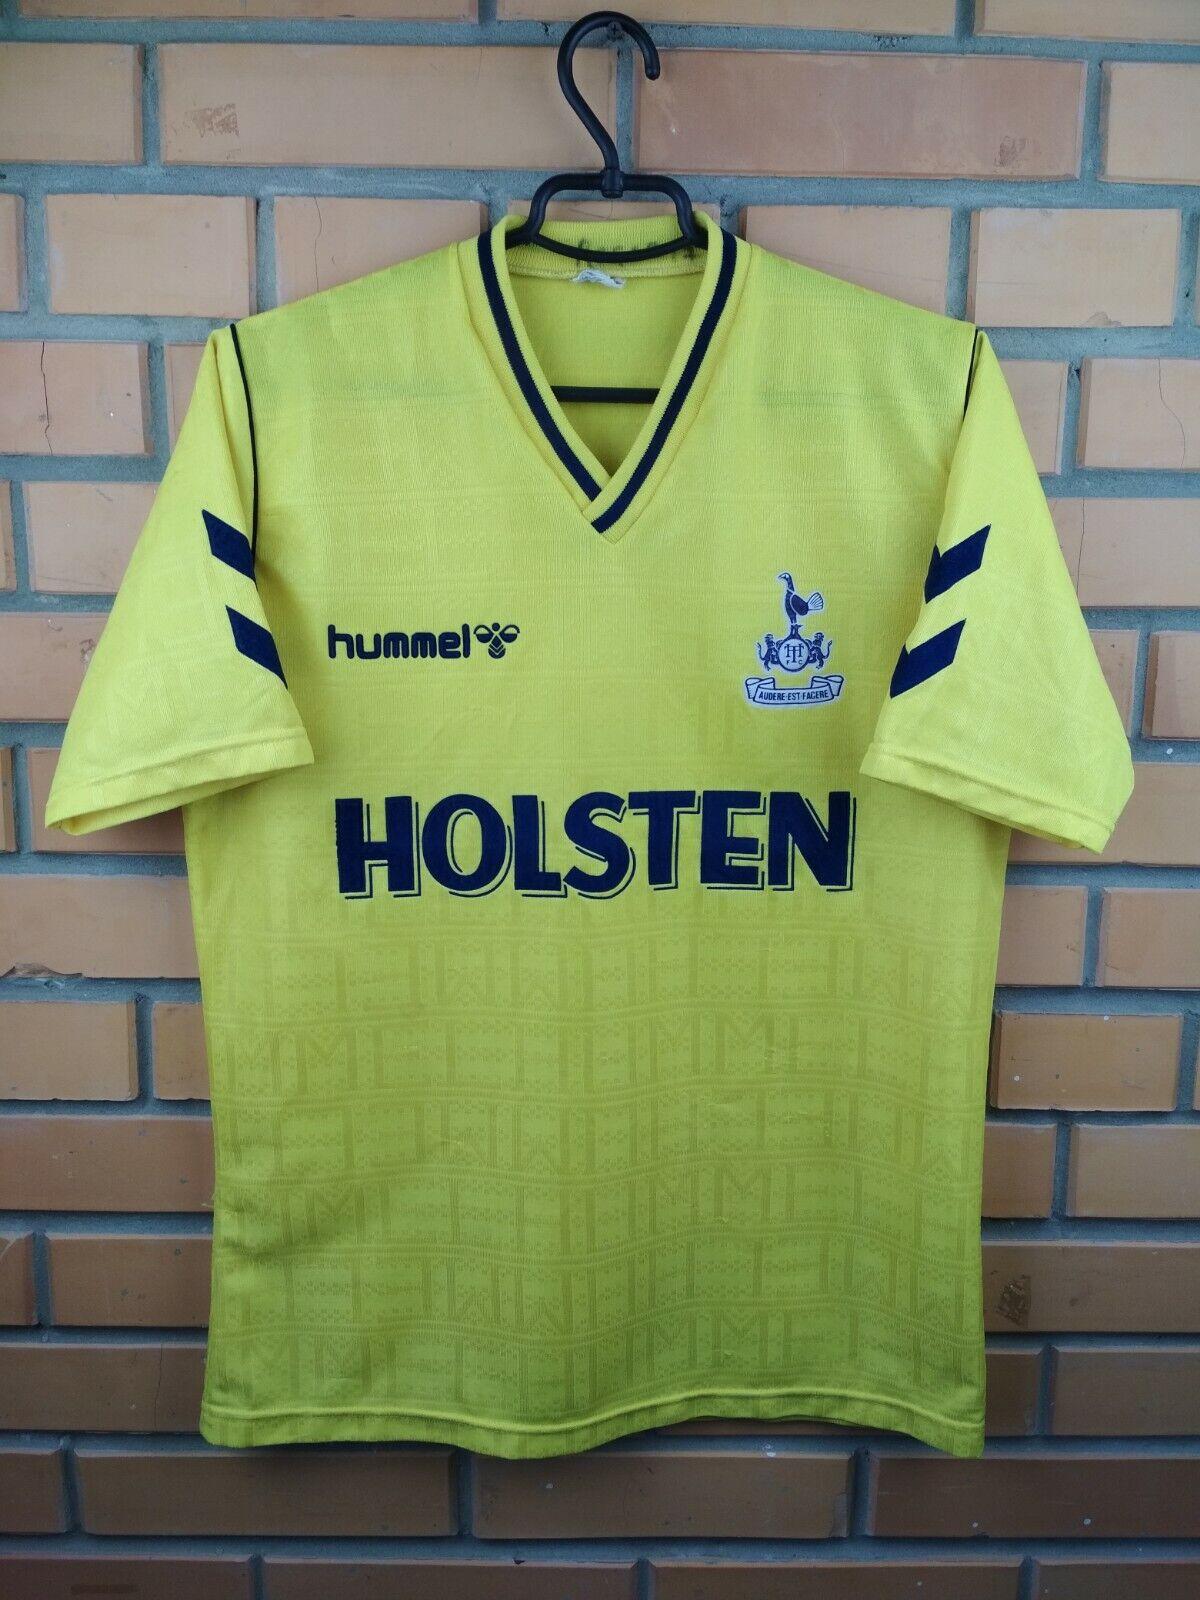 Tottenham Hotspur Camiseta Talle Medio 1988 1991 Away Camiseta De Fútbol Fútbol Hummel